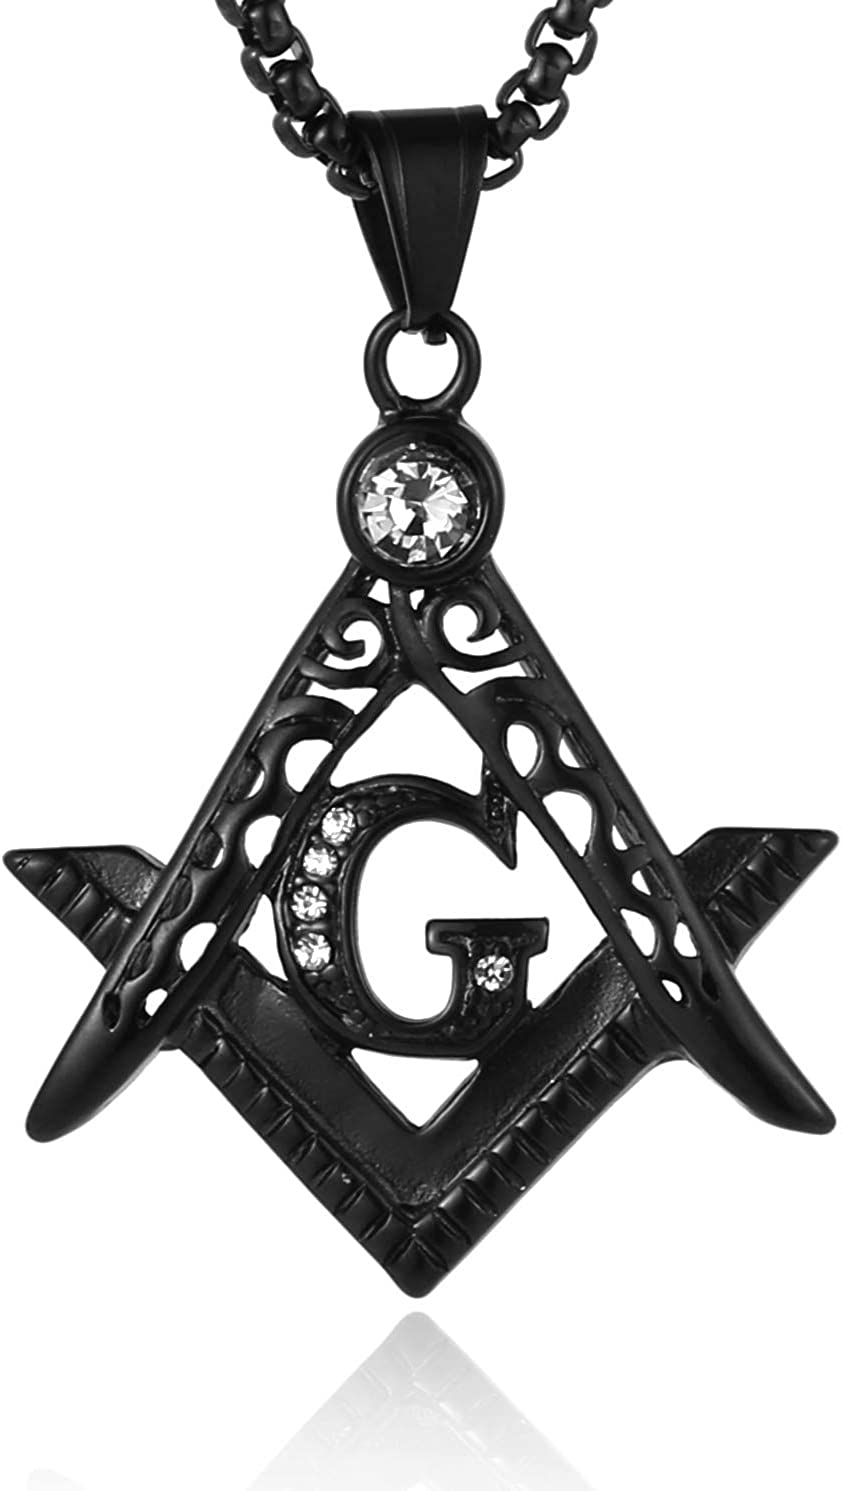 HZMAN Mens Cubic Zirconia Freemason Symbol Masonic Stainless Steel Pendant Necklace 22+2 inch Chain